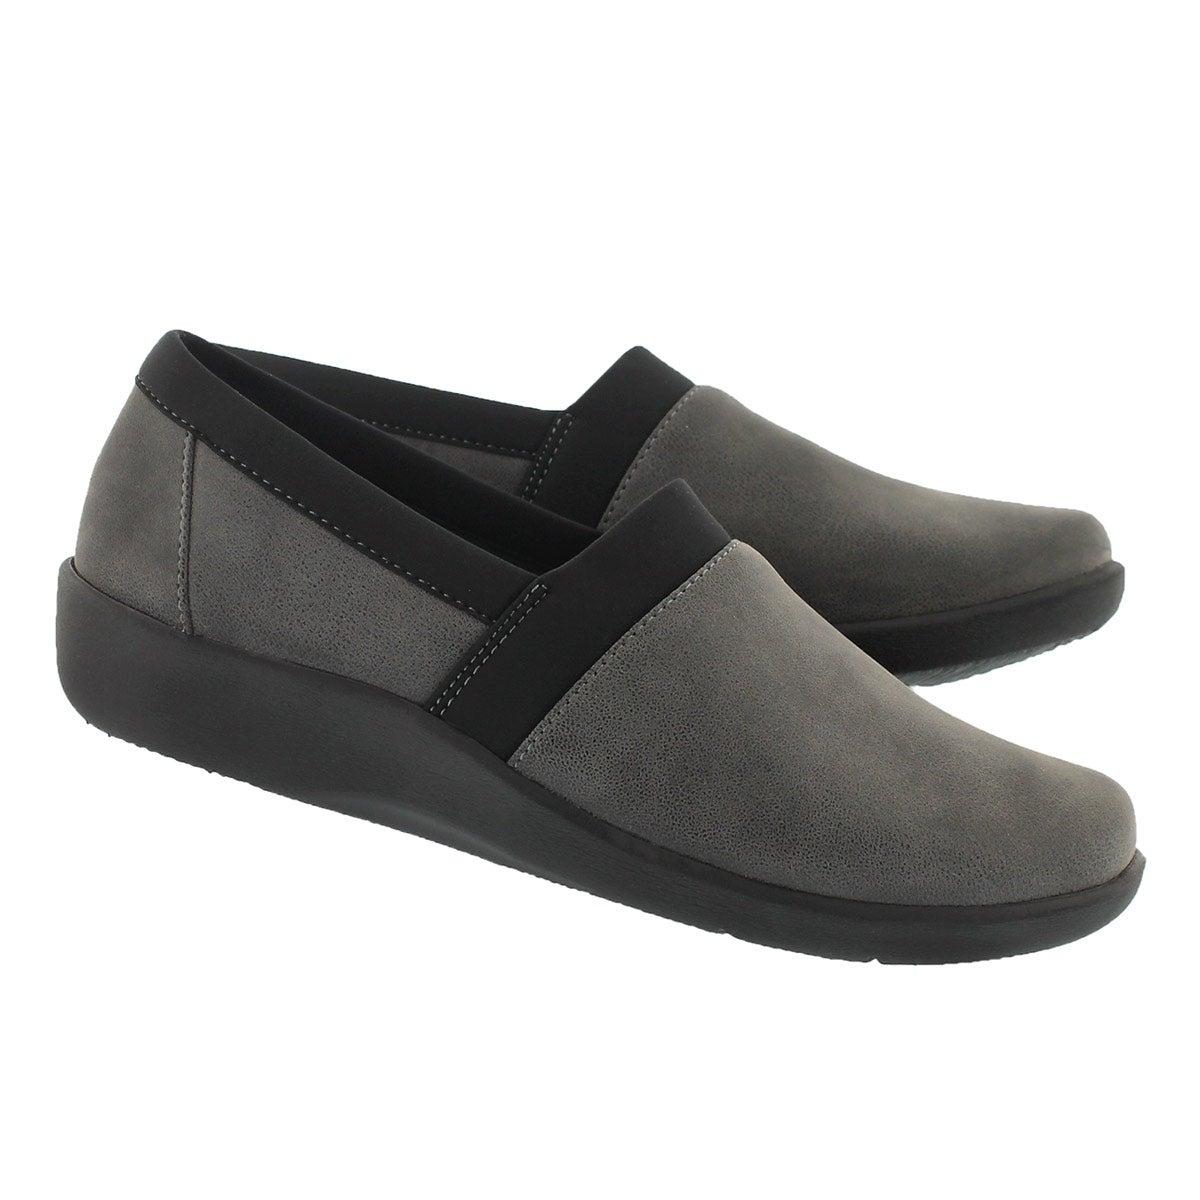 Lds Sillian Blair grey slip on loafer